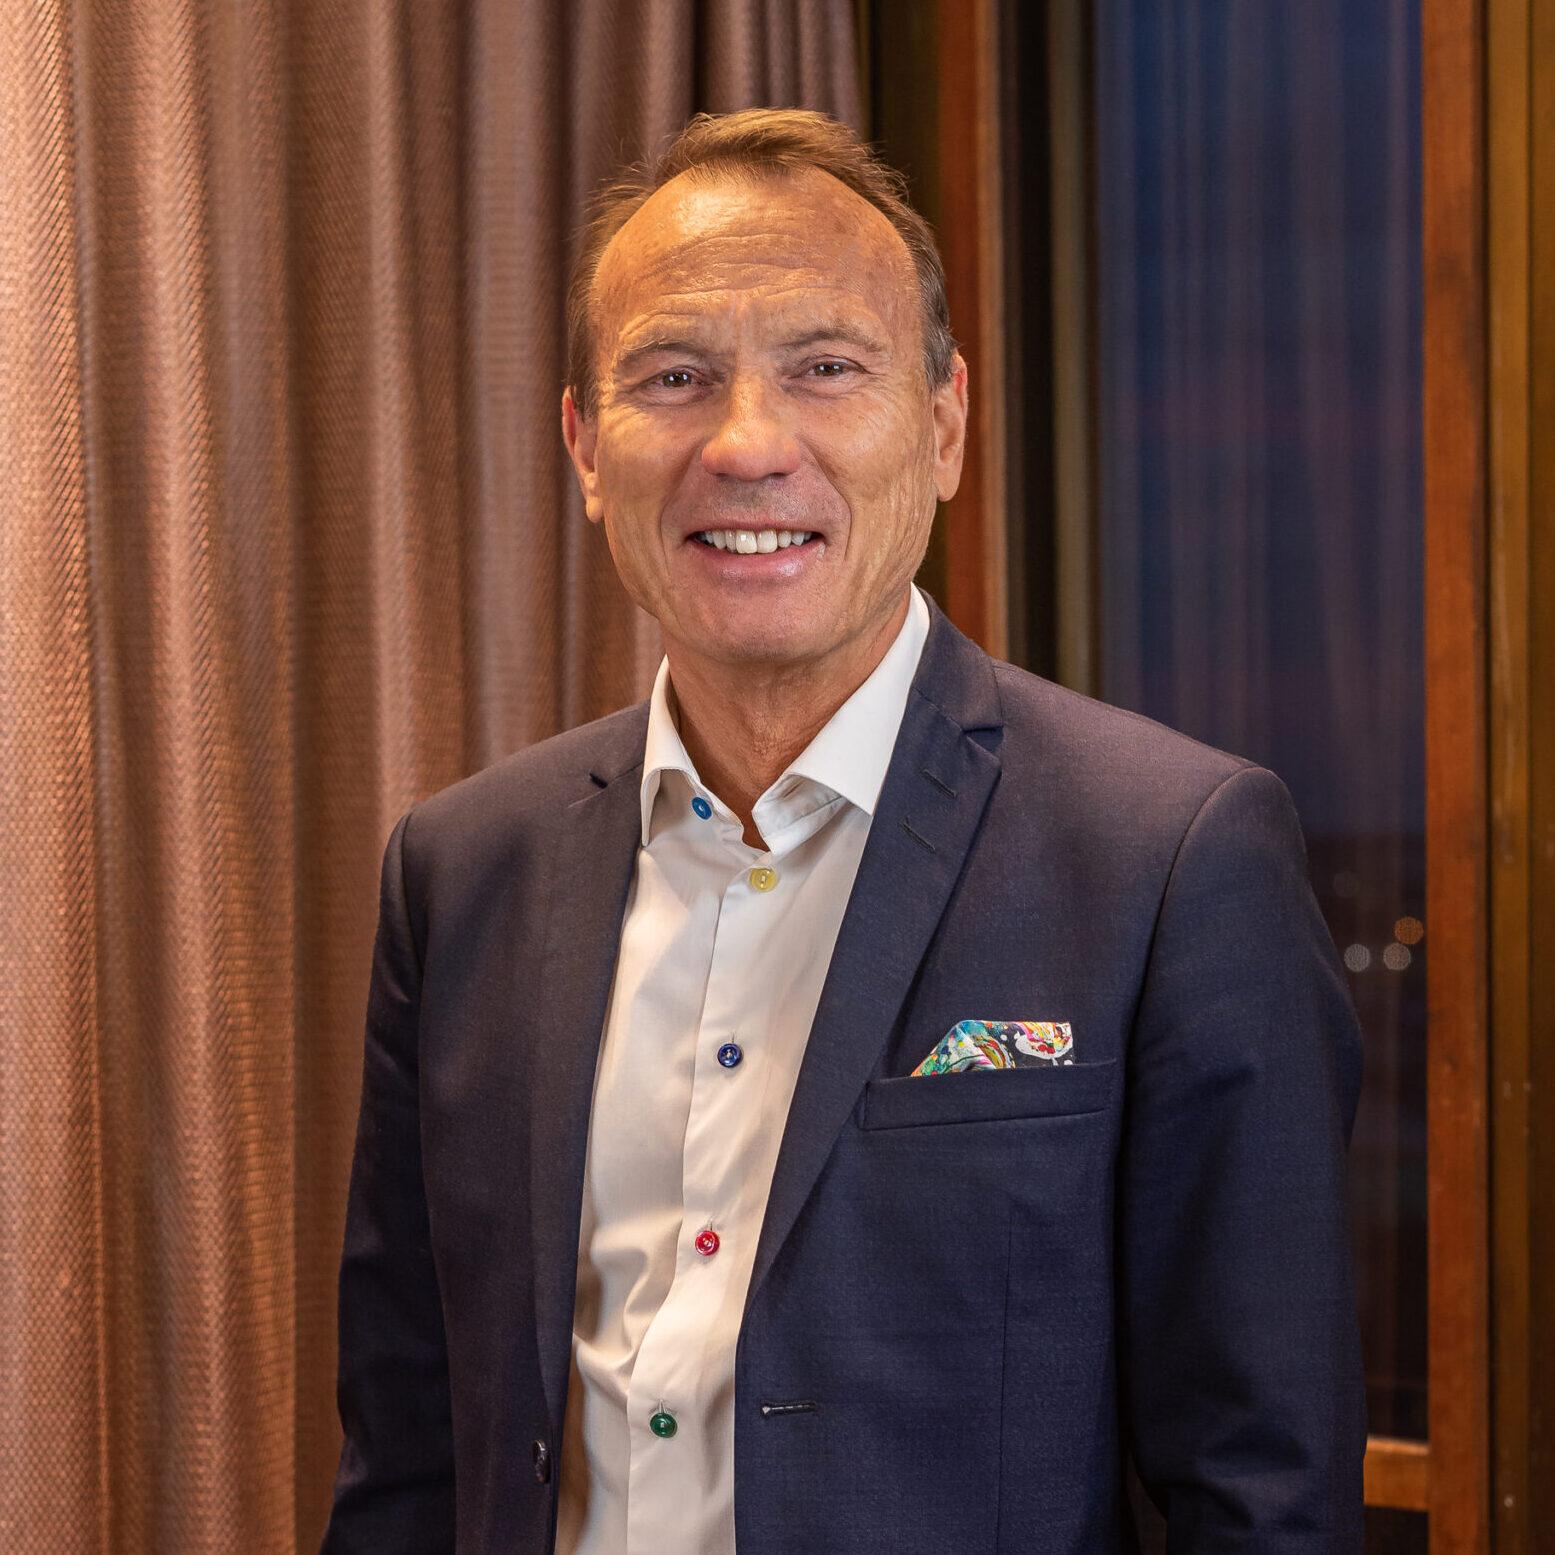 Magnus Jarlén